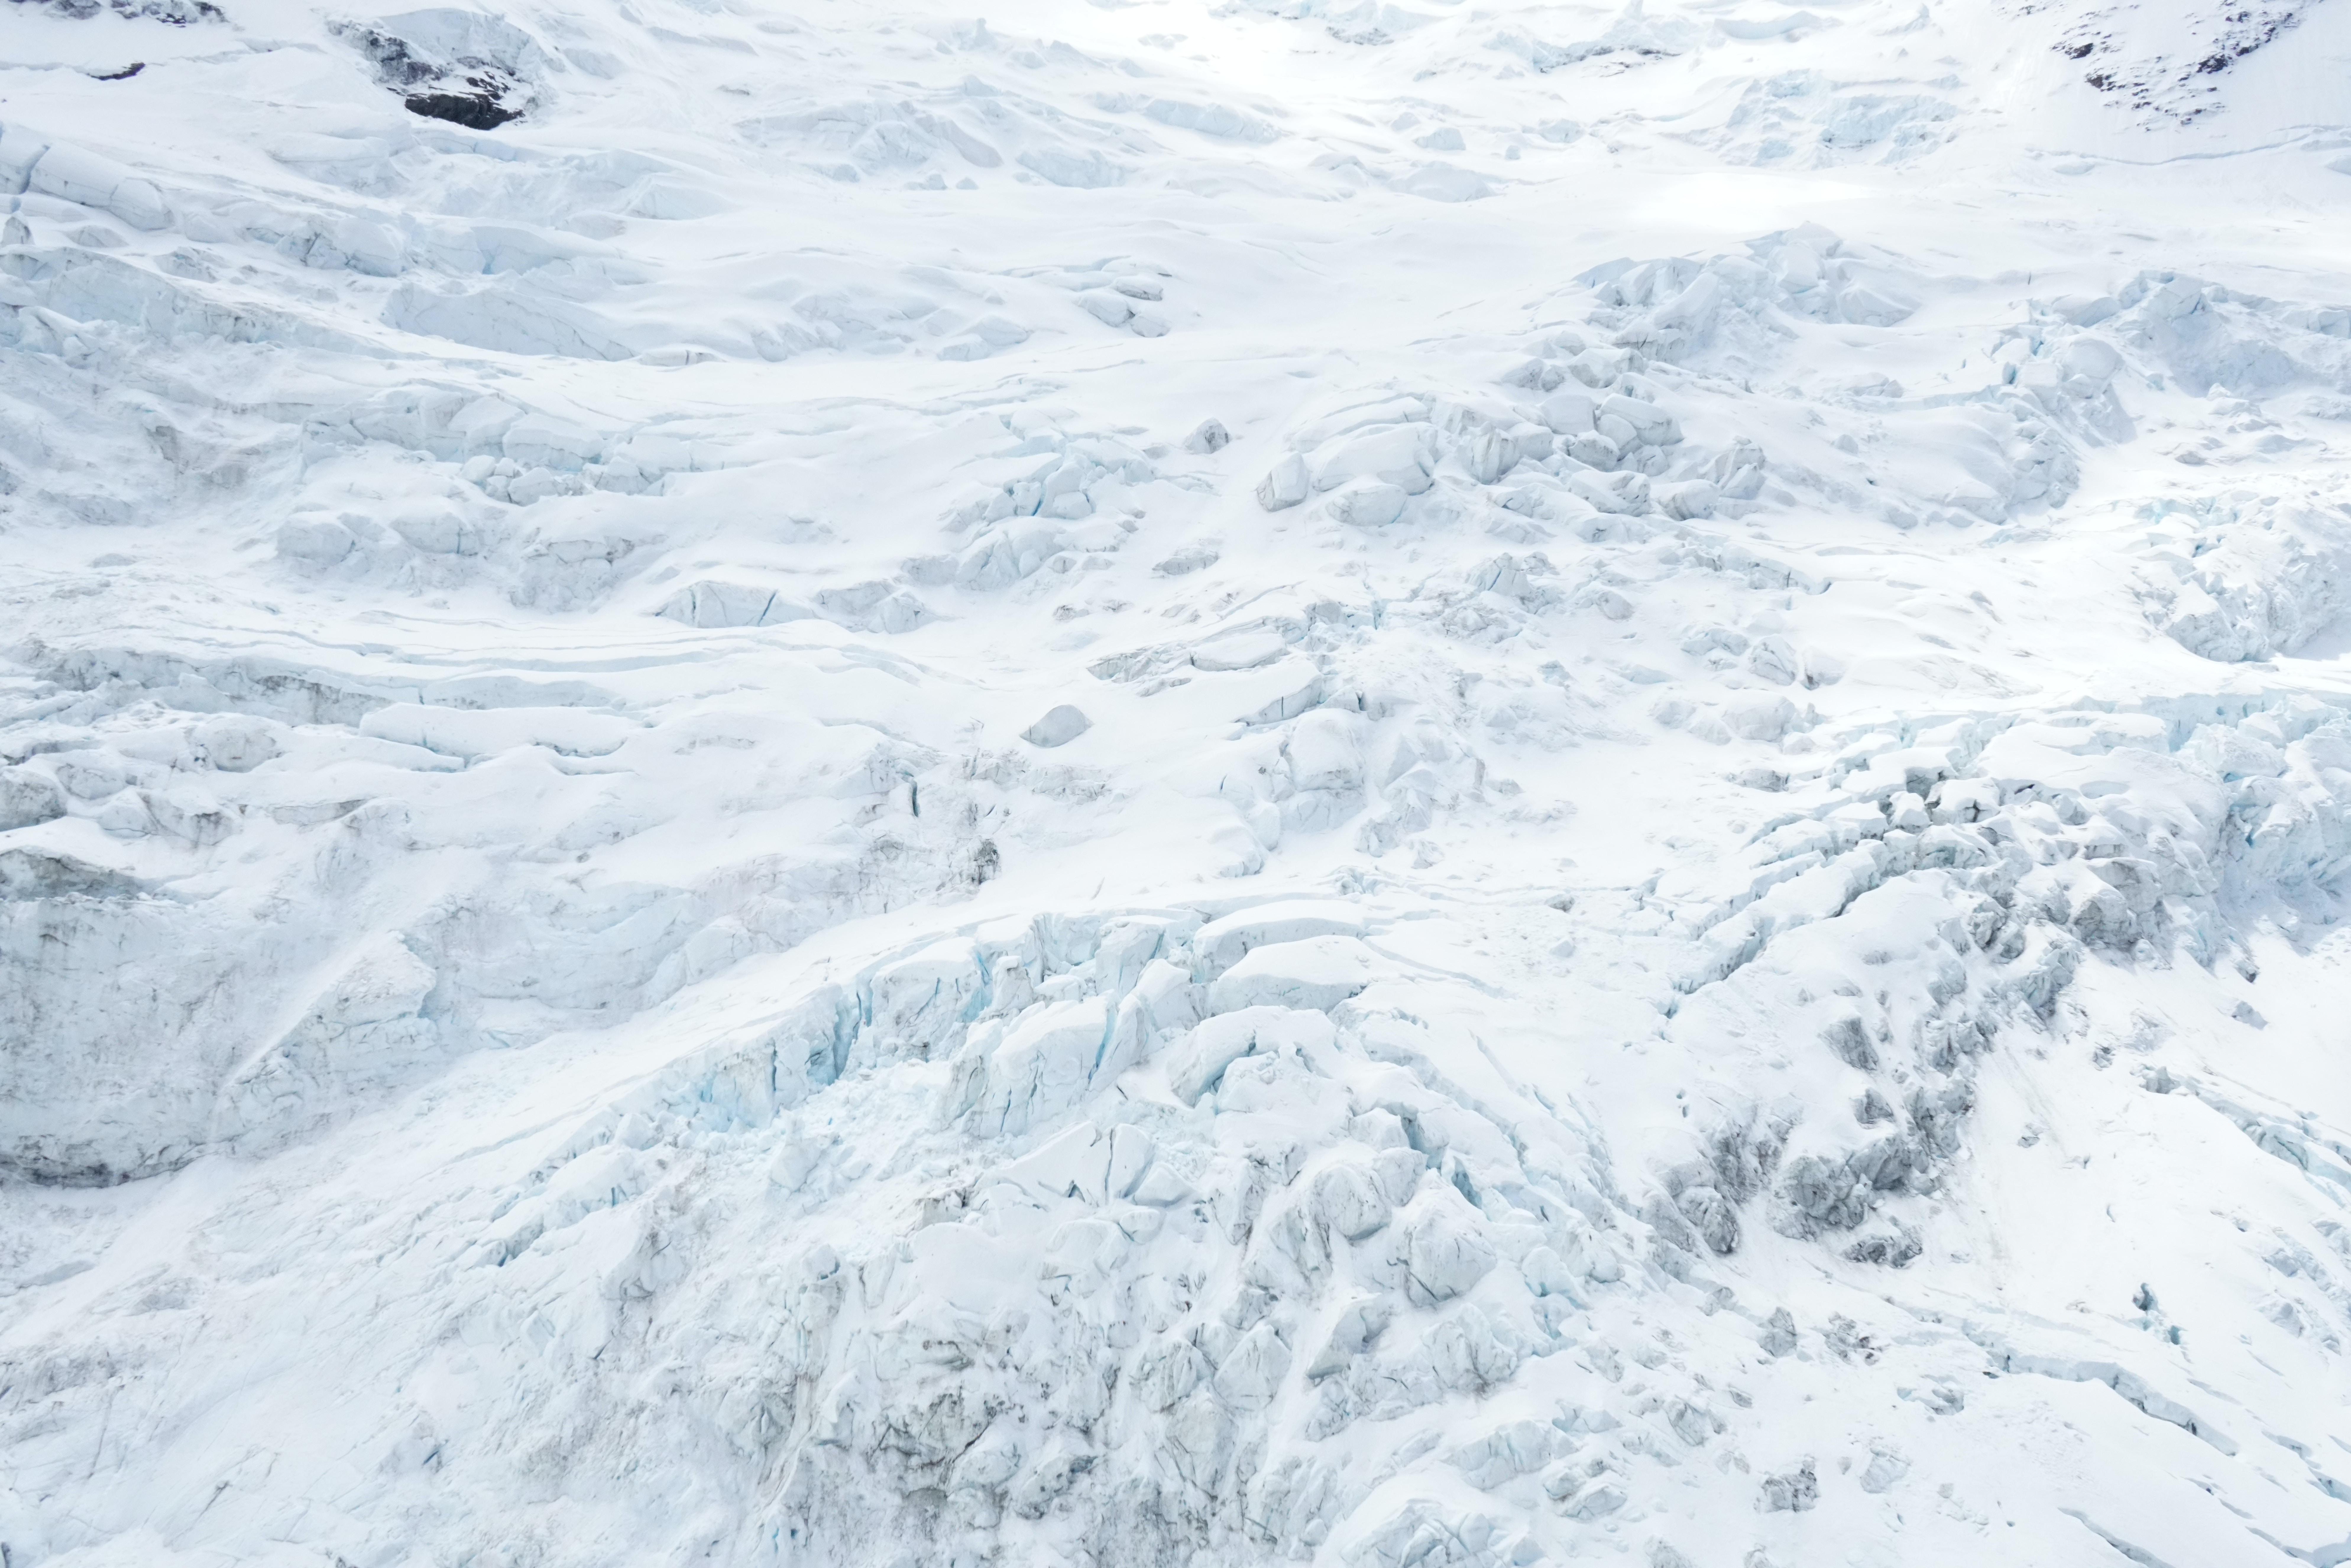 snow field photograph